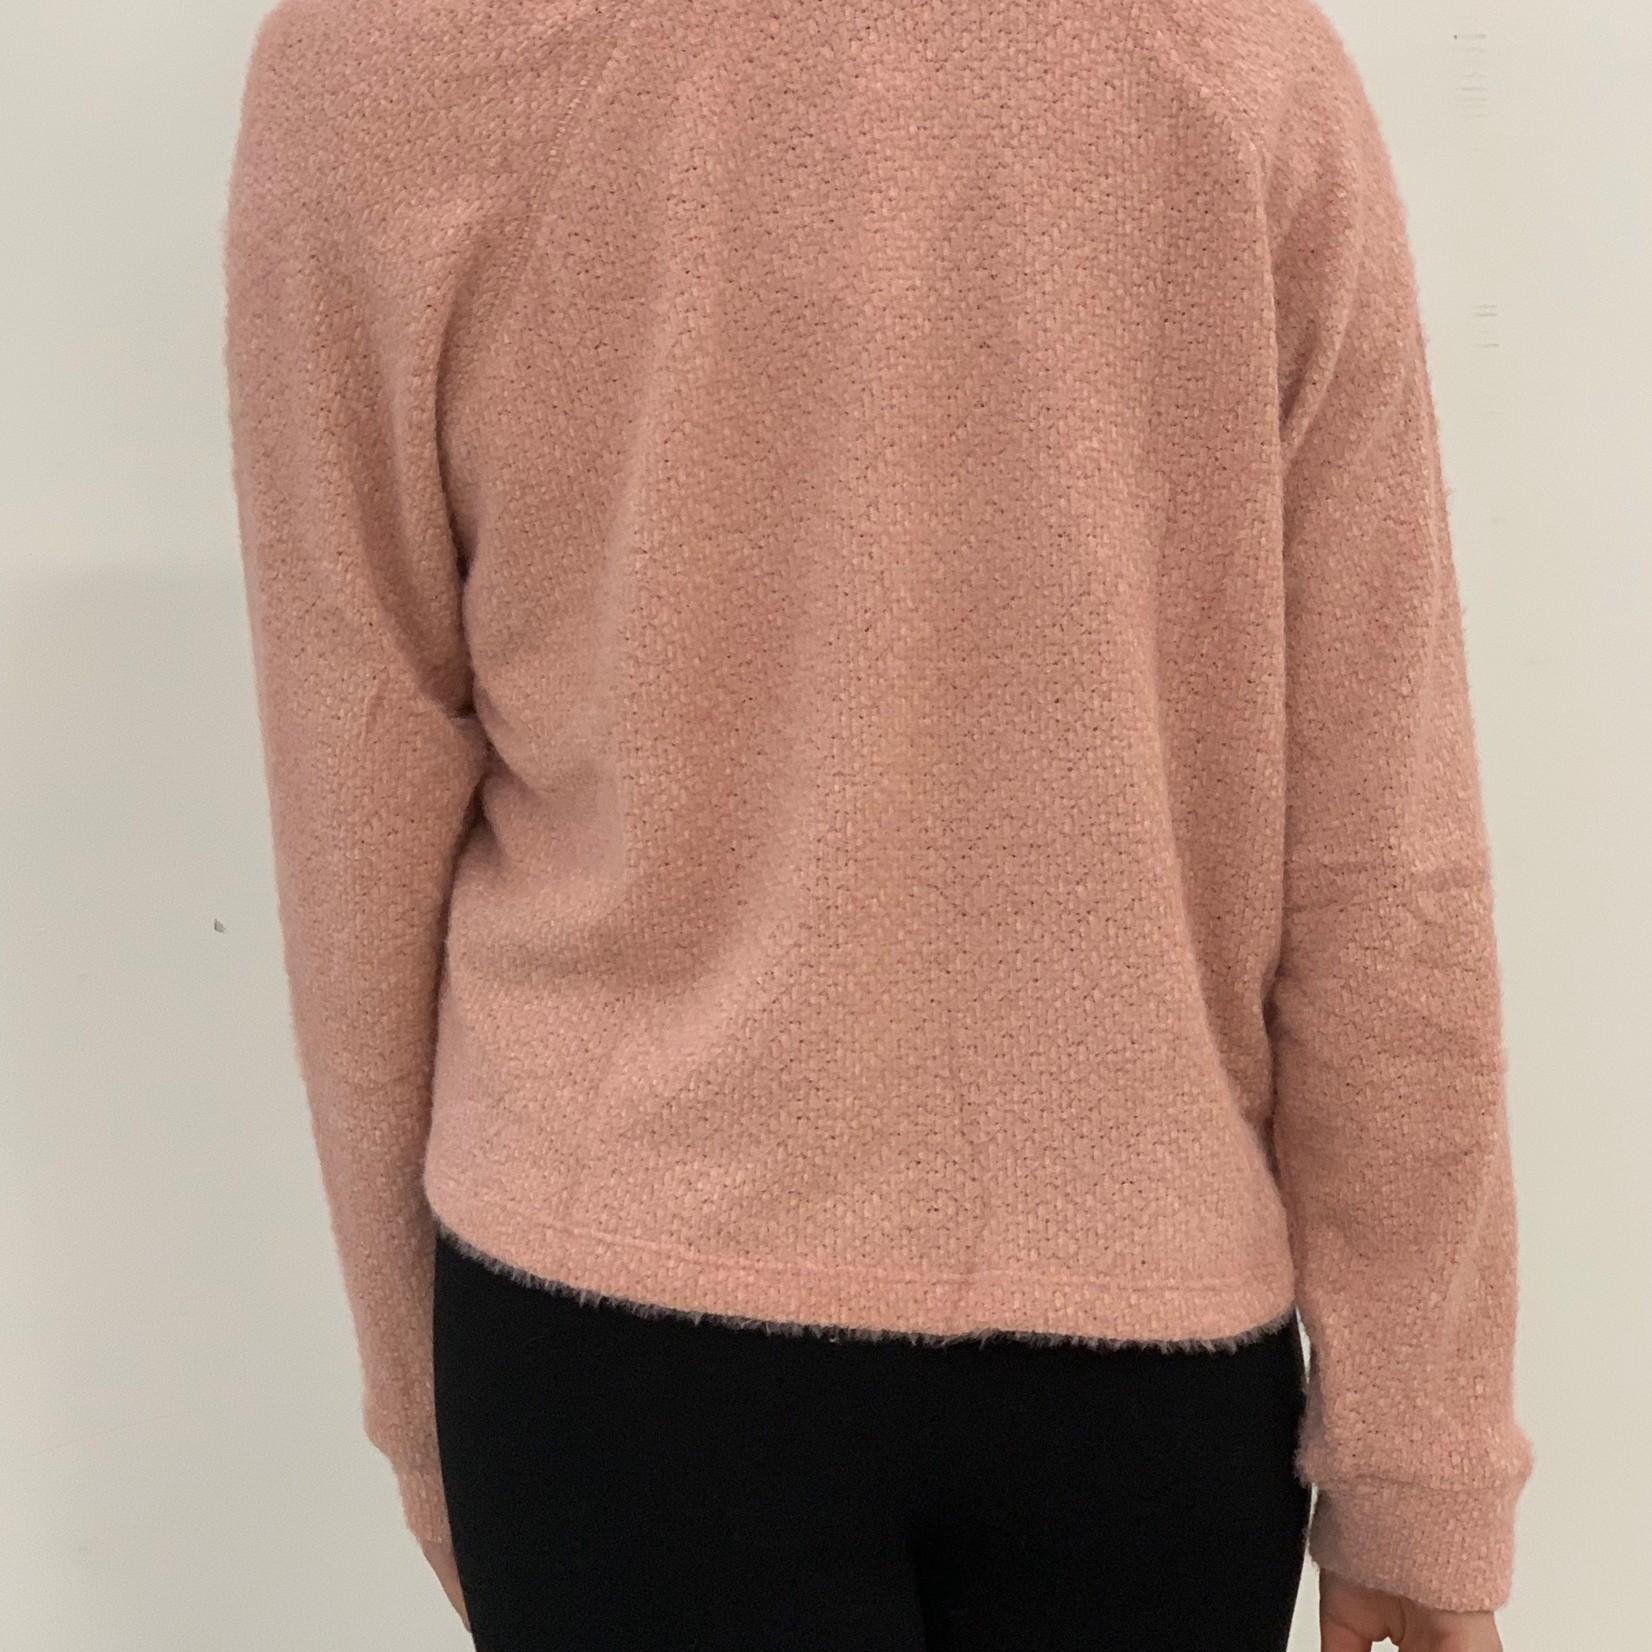 Hyda V-neck top